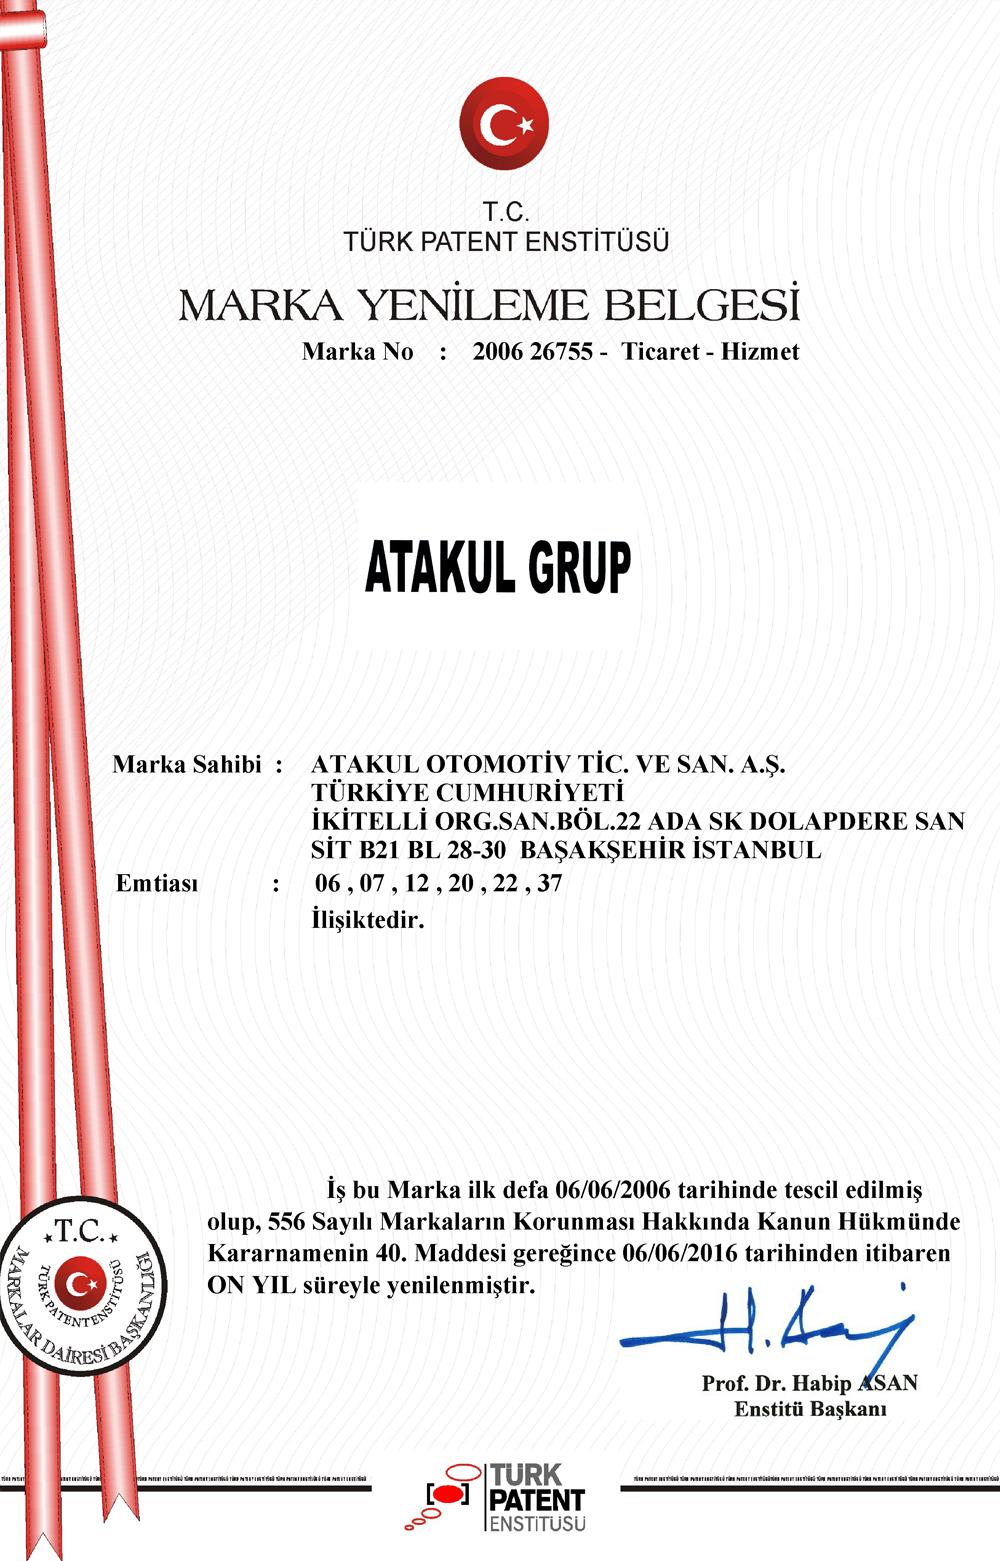 ATAKUL GROUP